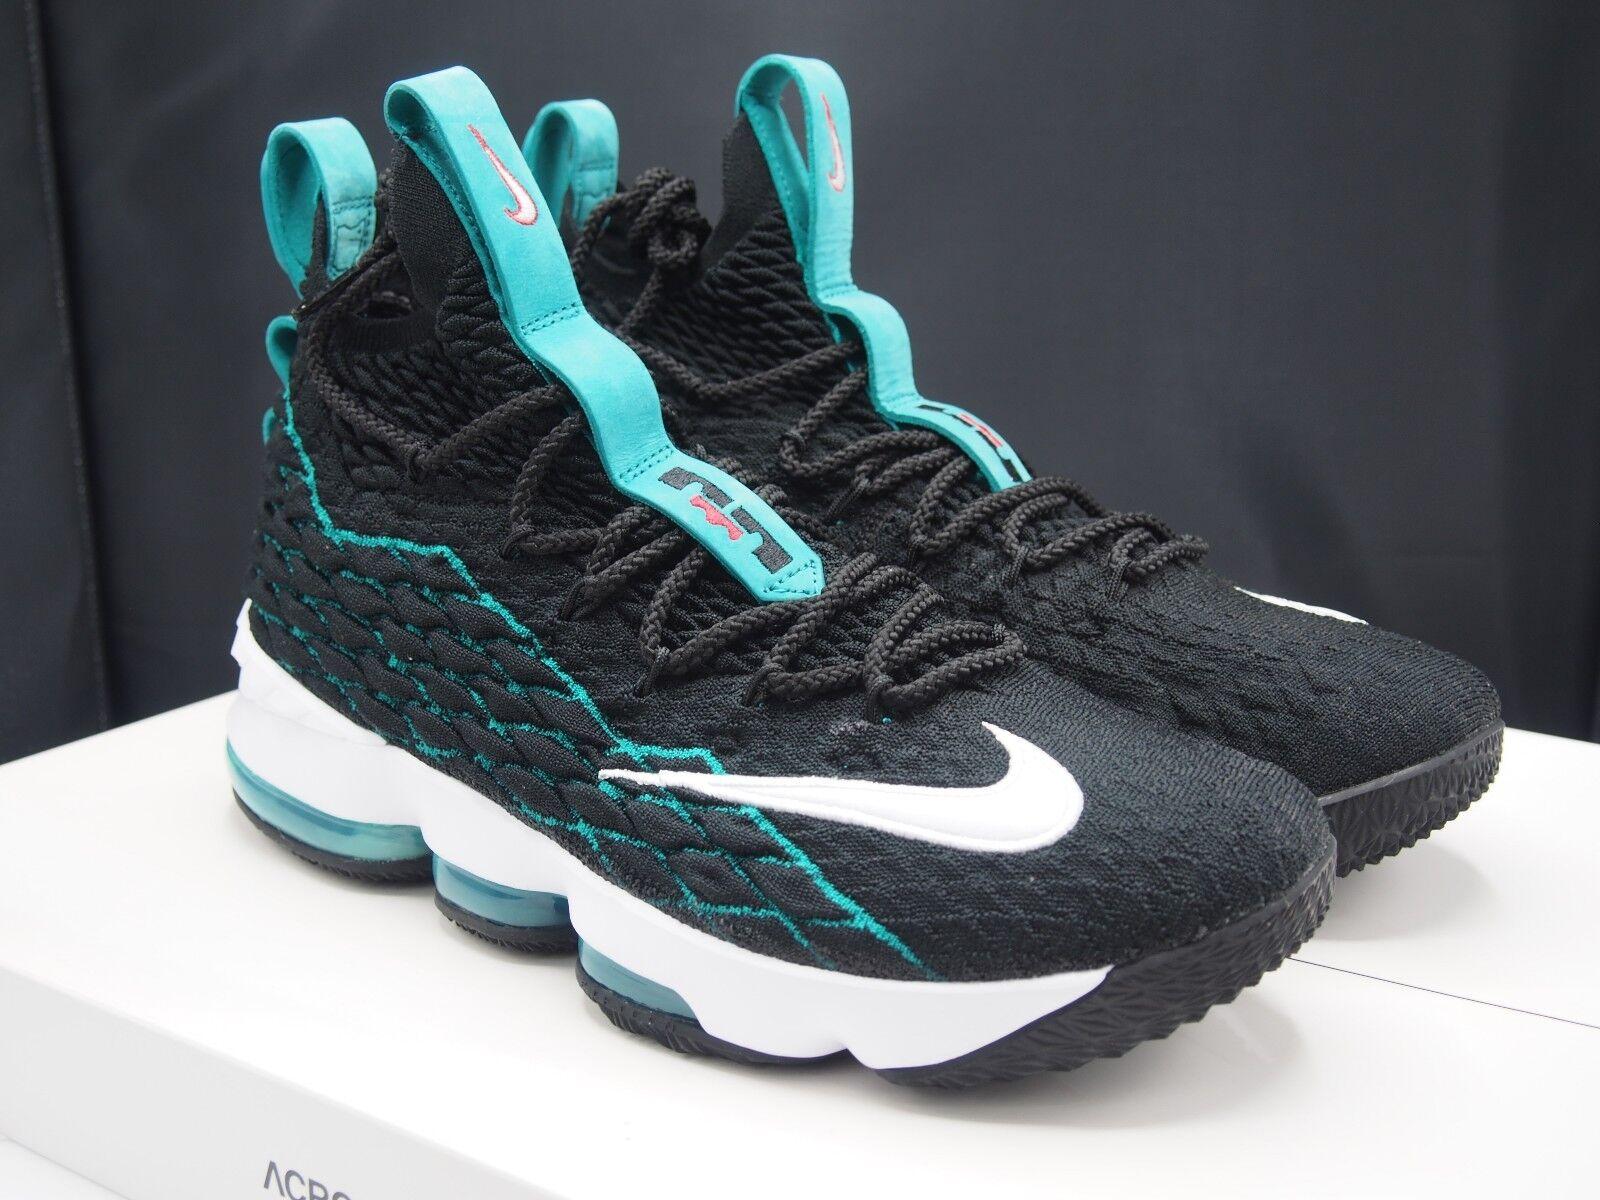 Nike Lebron XV 15 Griffey zapatos Basketball zapatos Griffey  9.5 Lebron Watch PE 5adc78